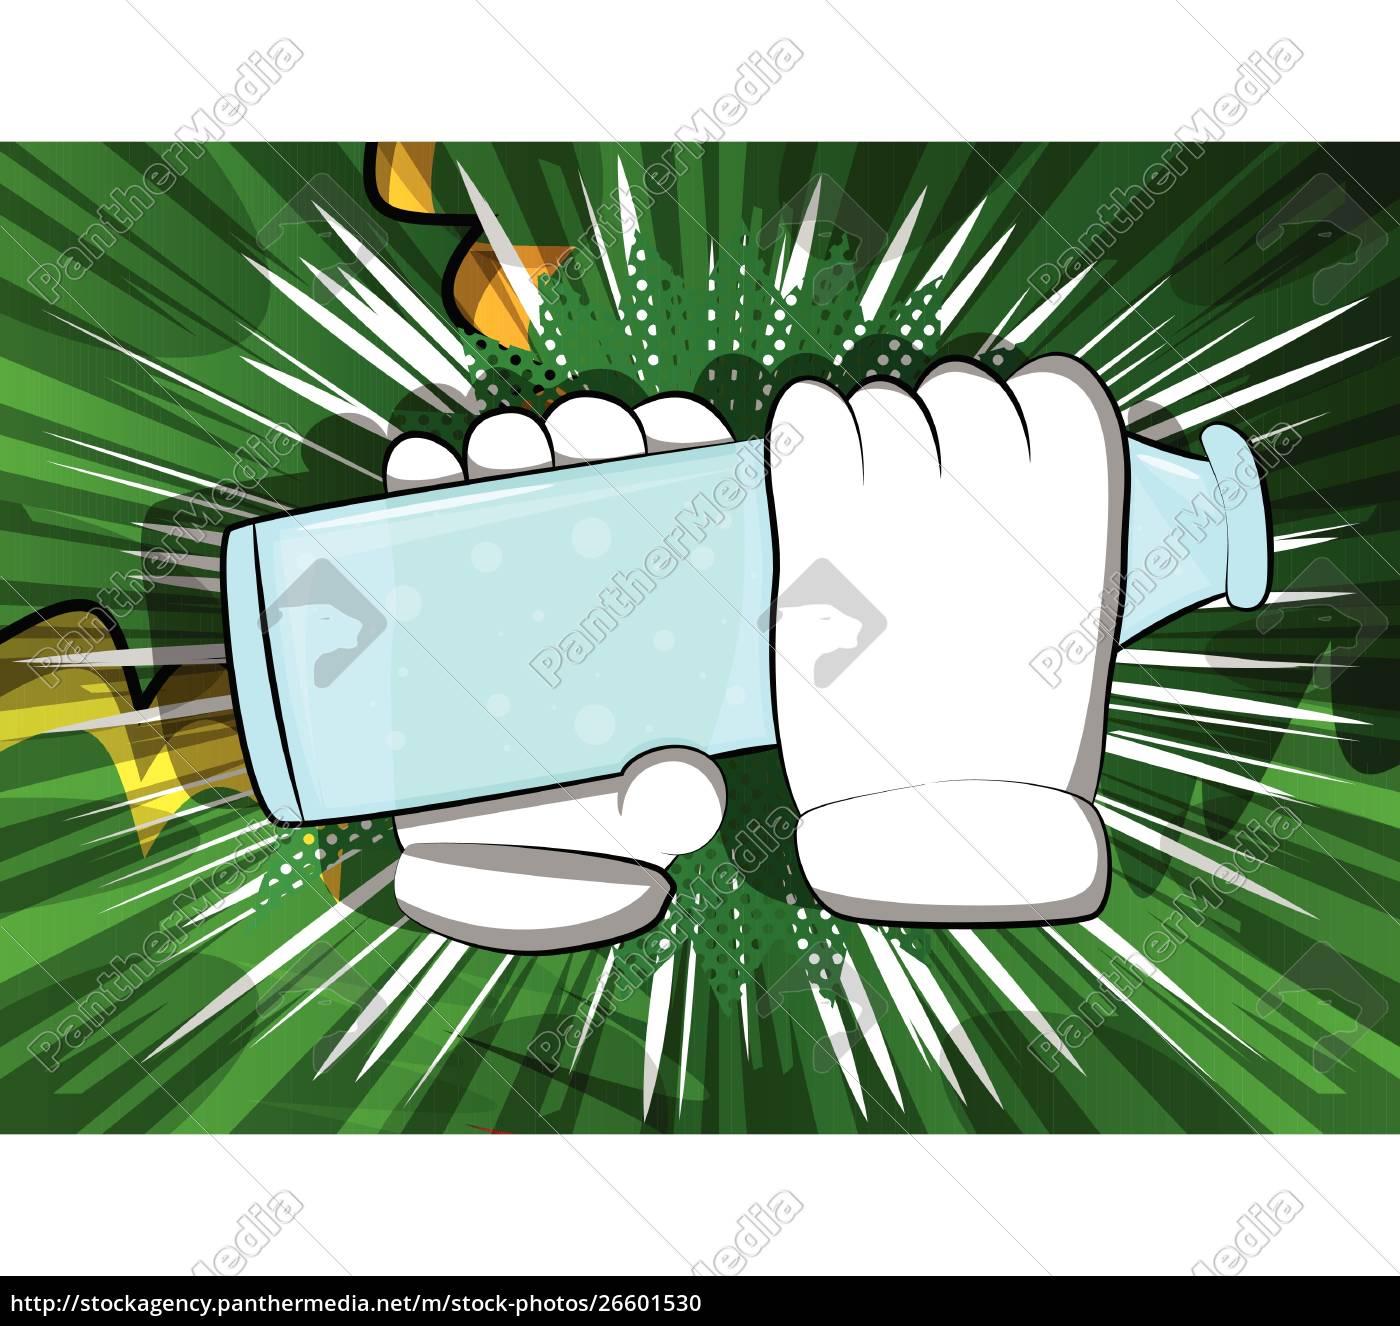 cartoon, hands, holding, a, beer. - 26601530